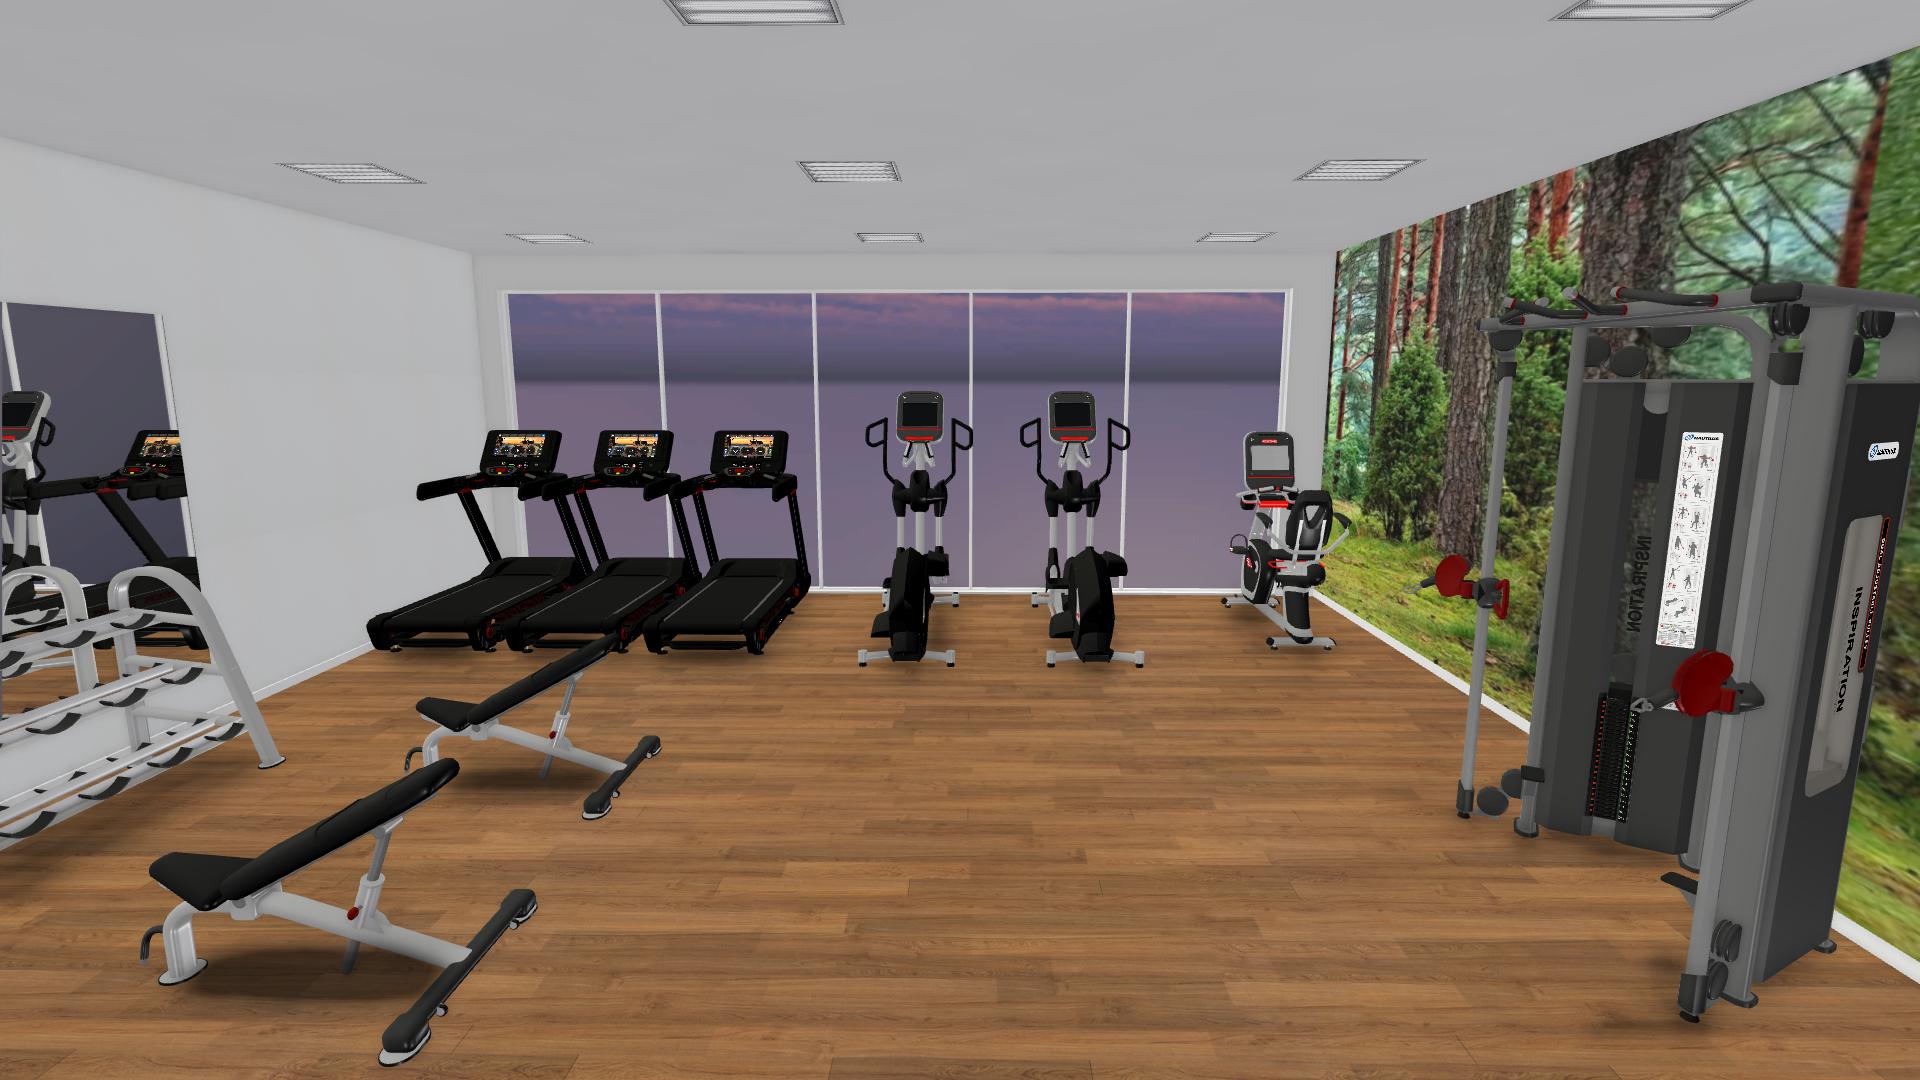 Fitness Center Design - Sport and Fitness Inc